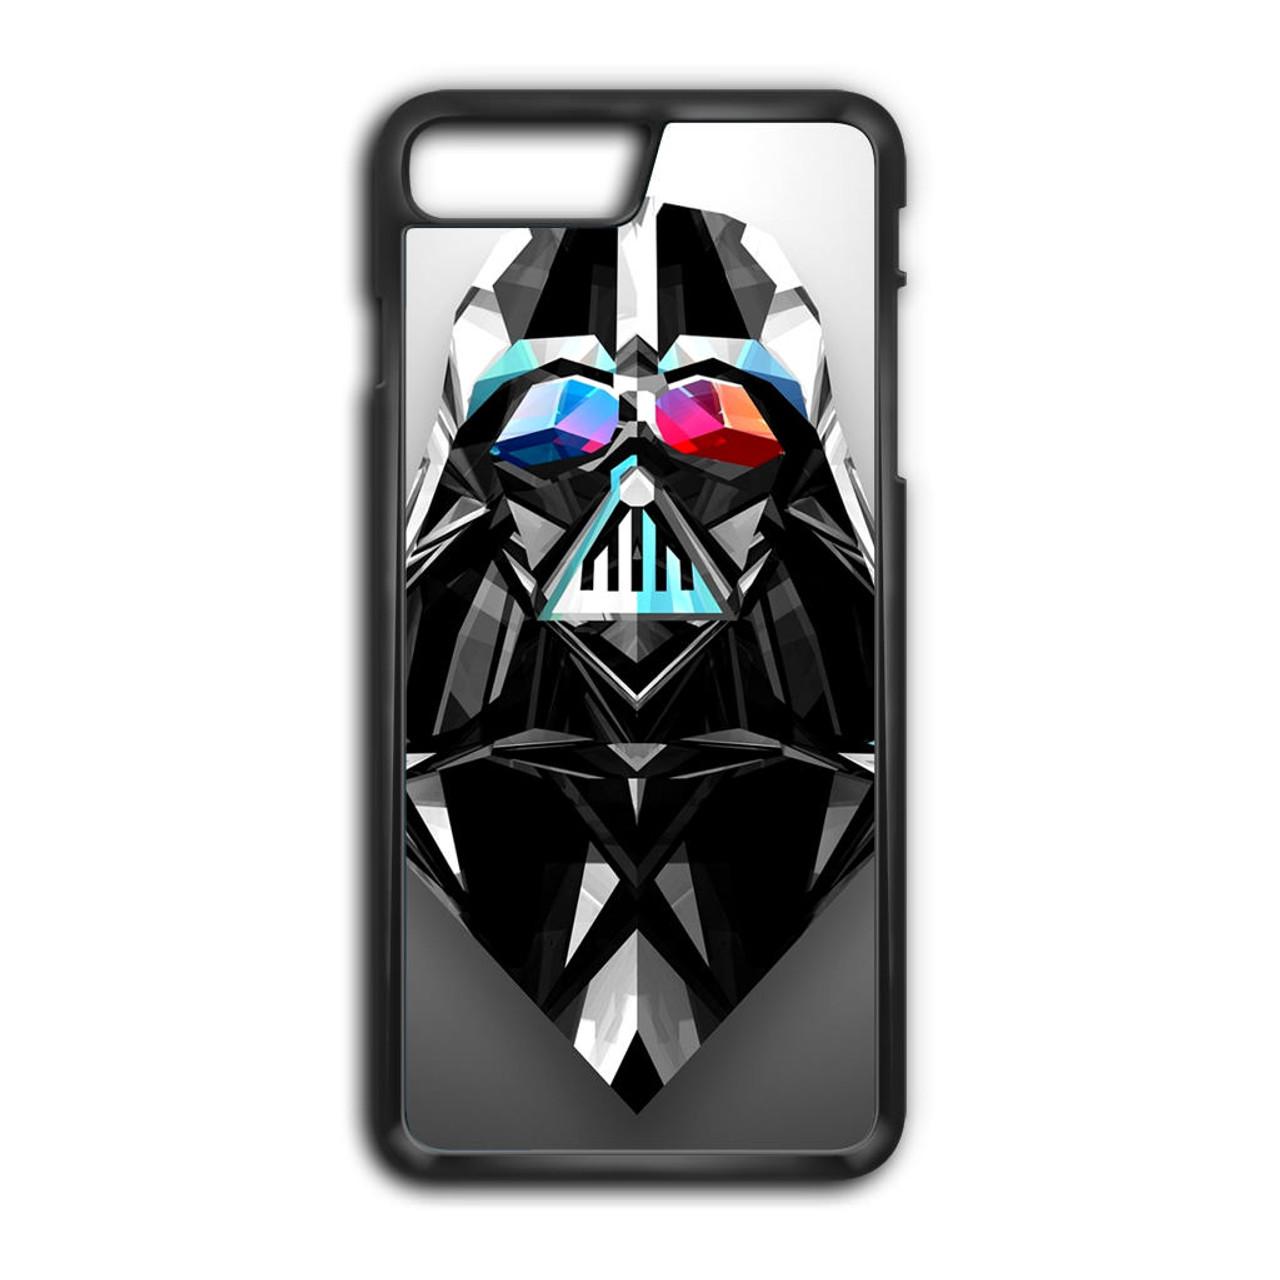 finest selection 415f2 942f5 Movie Starwars Darth Vader Artistic Geometric iPhone 7 Plus Case ...